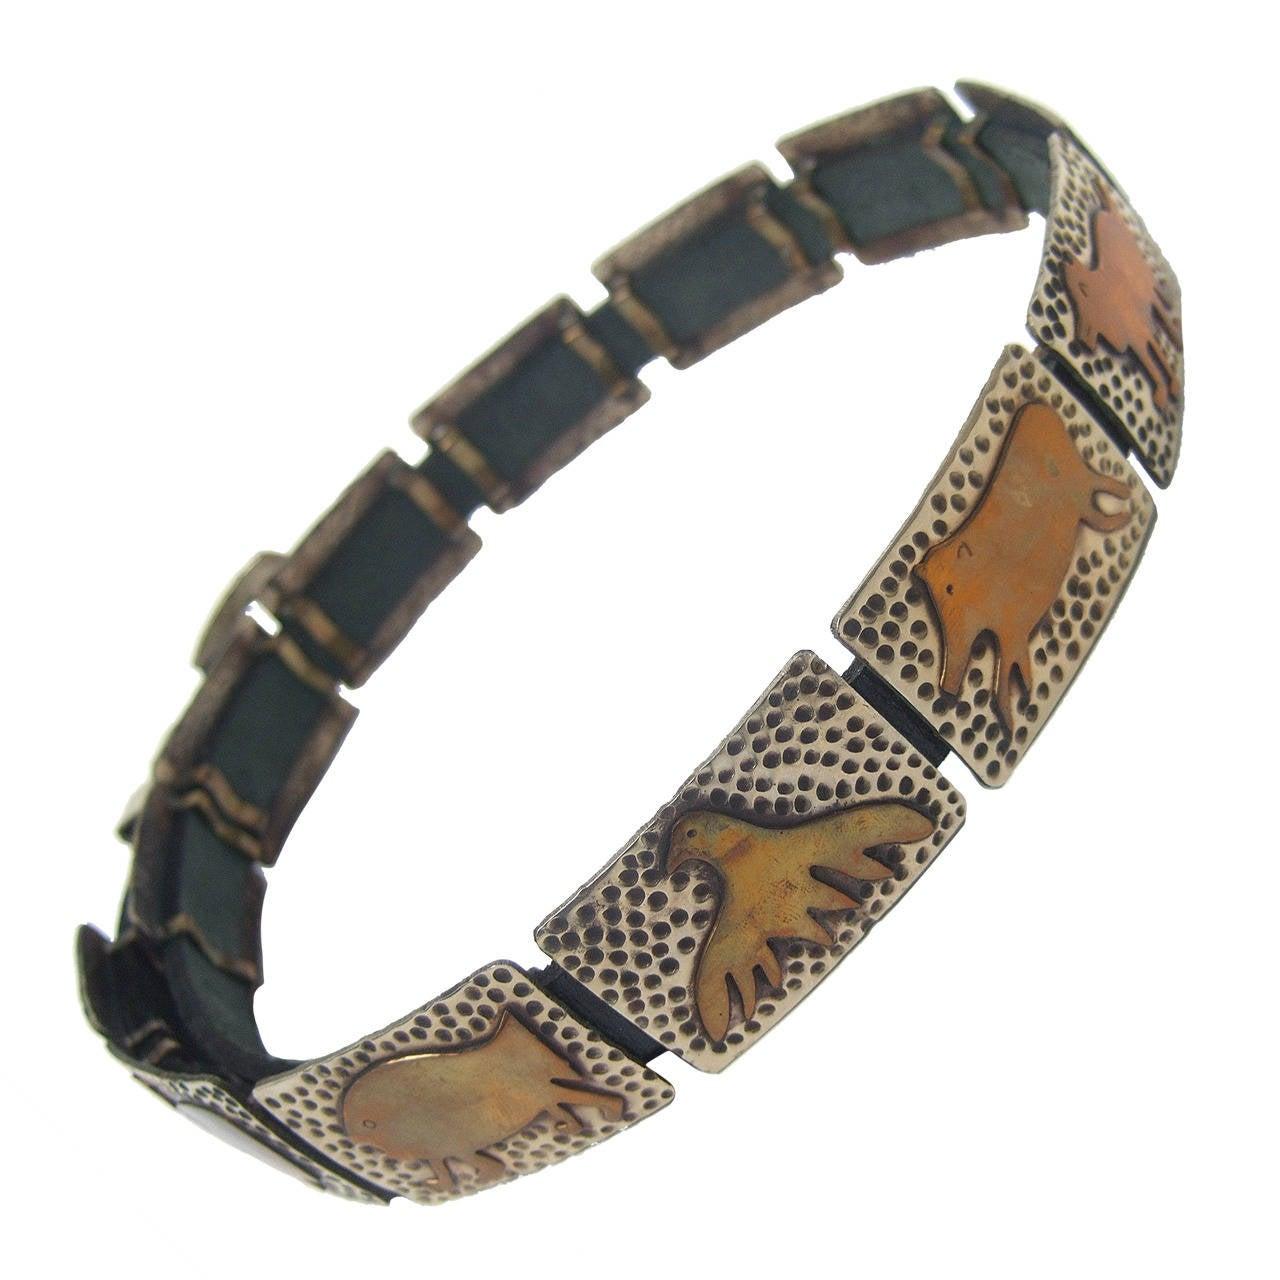 Hand Forged Mixed Metal Artisan Animal Belt Designed by Lunacy Alpaca